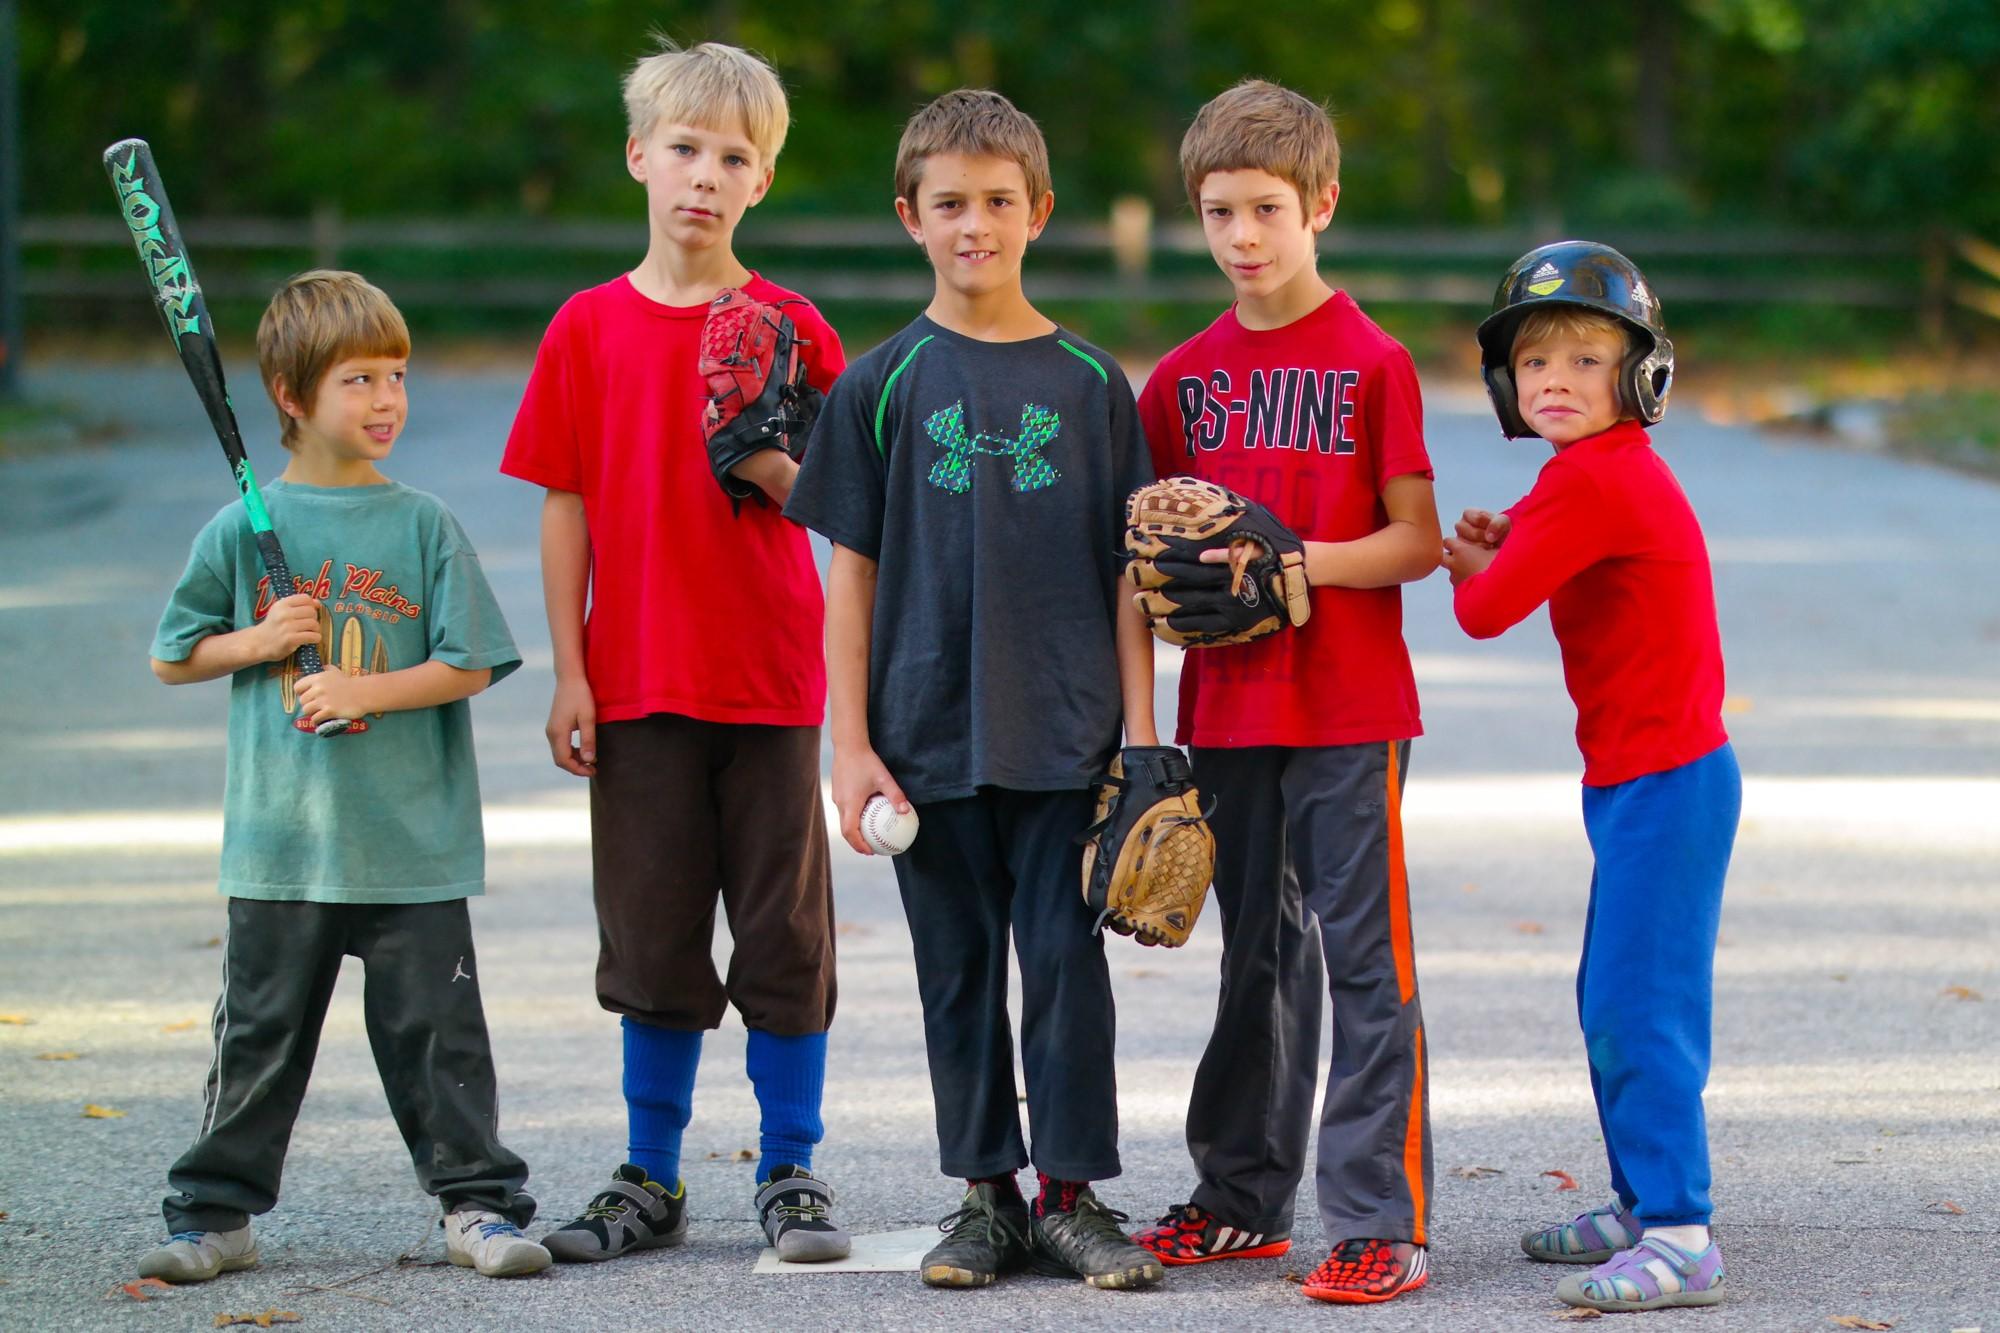 Baseball players taken with my DSLR camera.